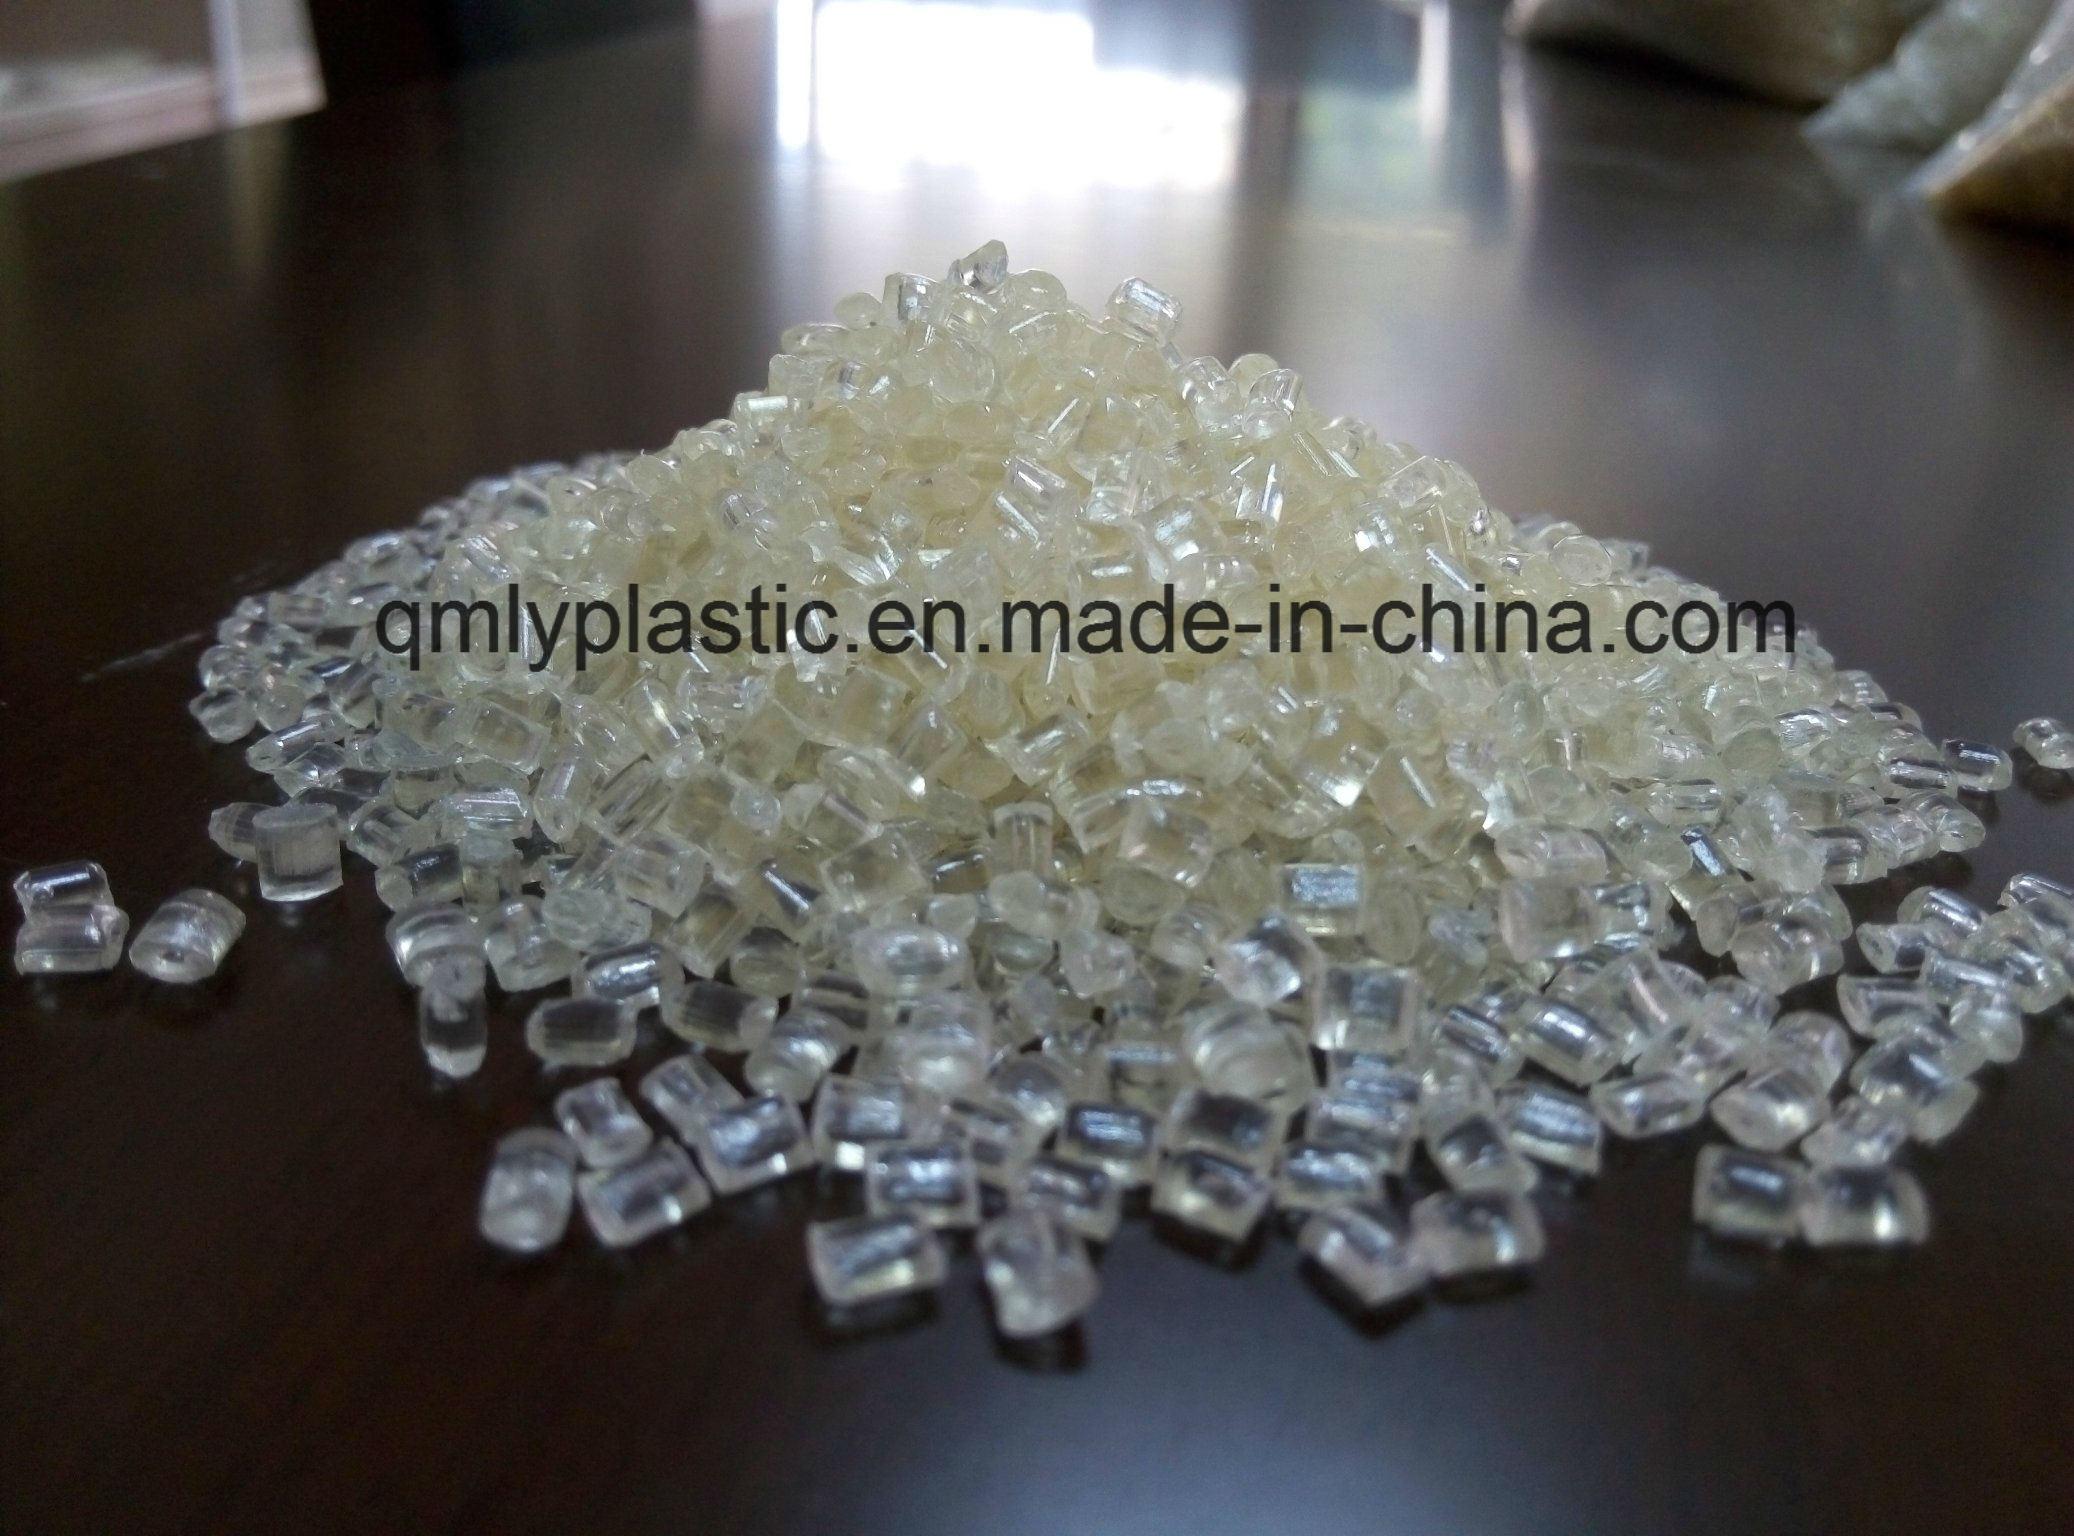 Amber Polysulfon (PSU) Udel Engineering Plastics Transparent and Rigid